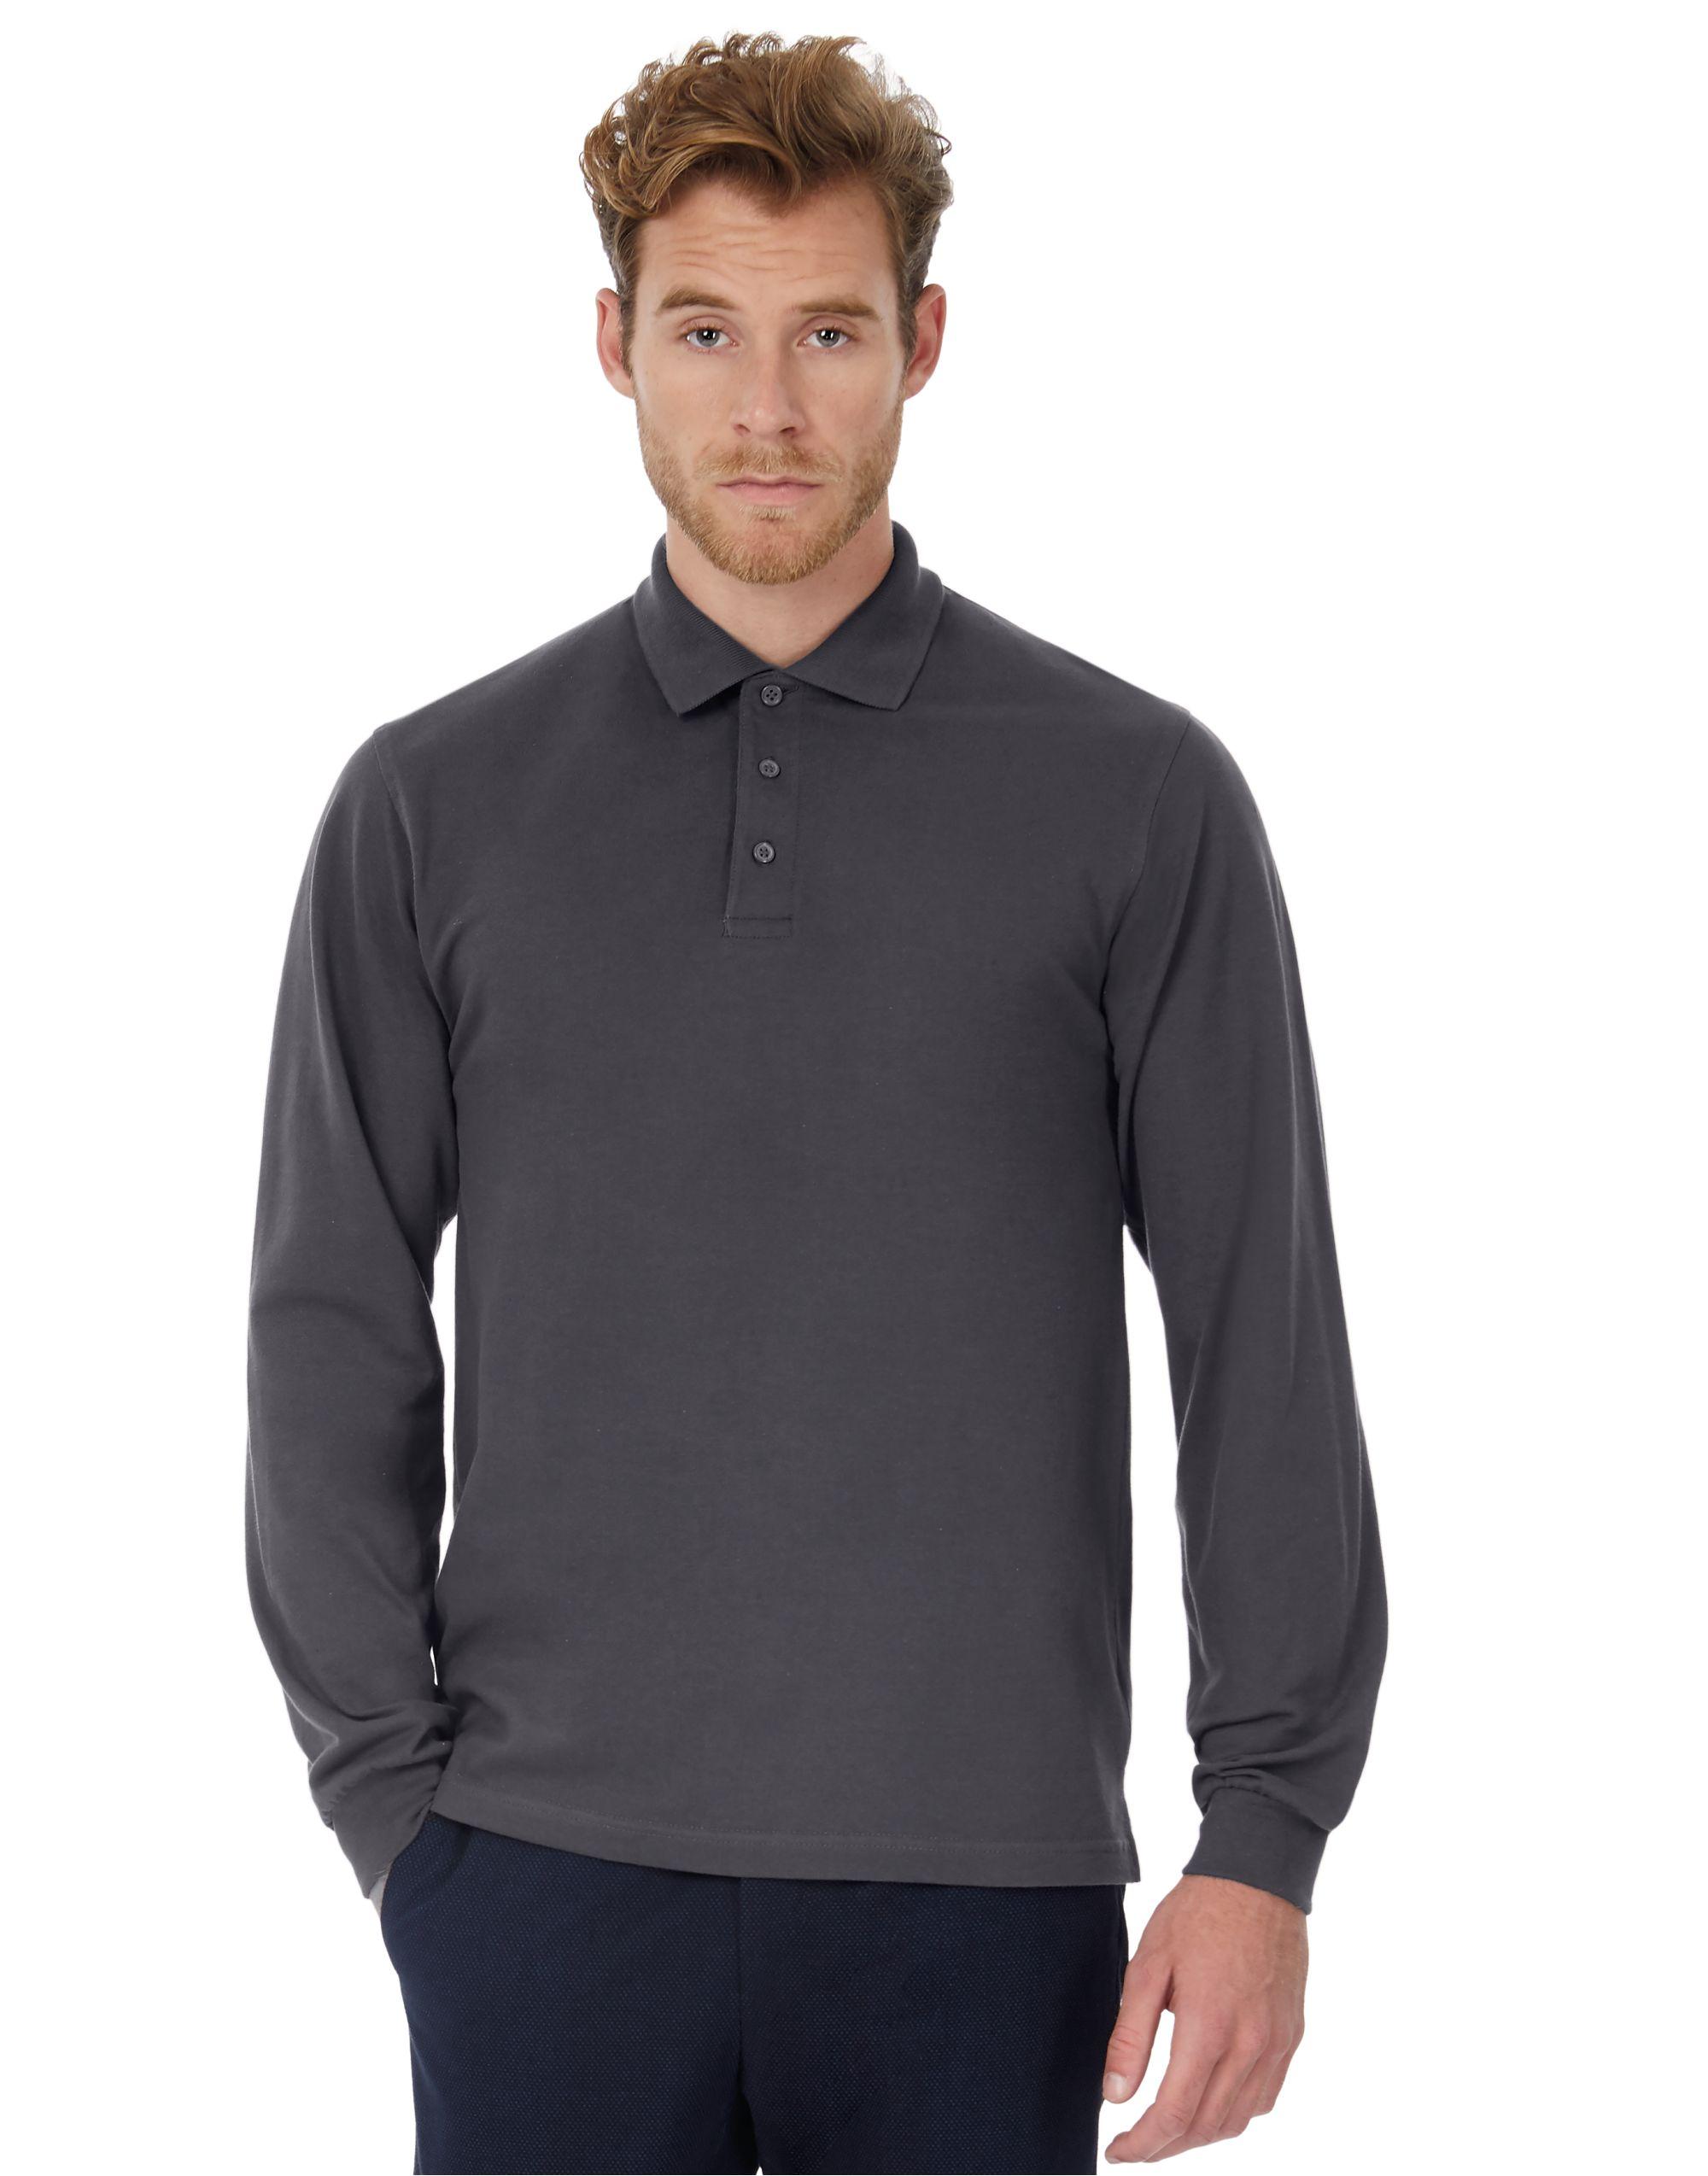 B&C Heavymill Long Sleeved Polo Shirt